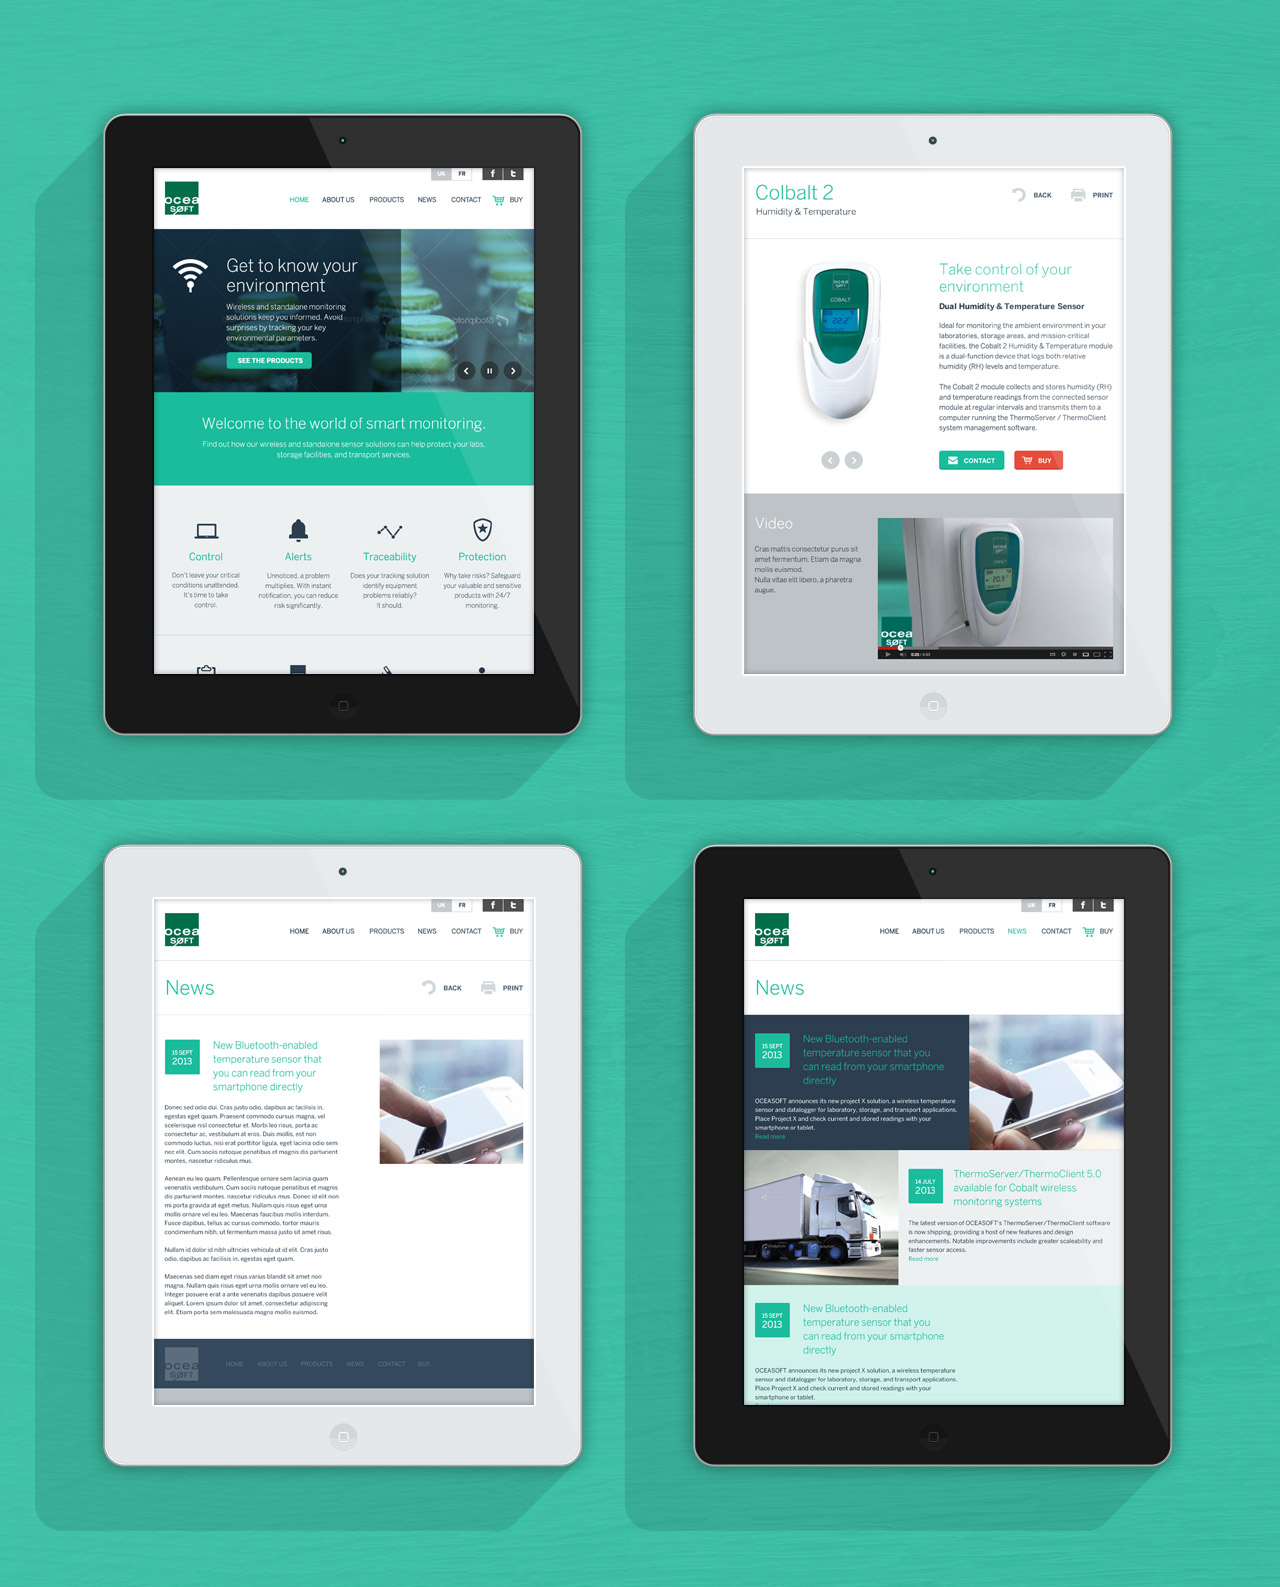 oceasoft-site-tablette-responsive-design-creation-communication-caconcept-alexis-cretin-graphiste